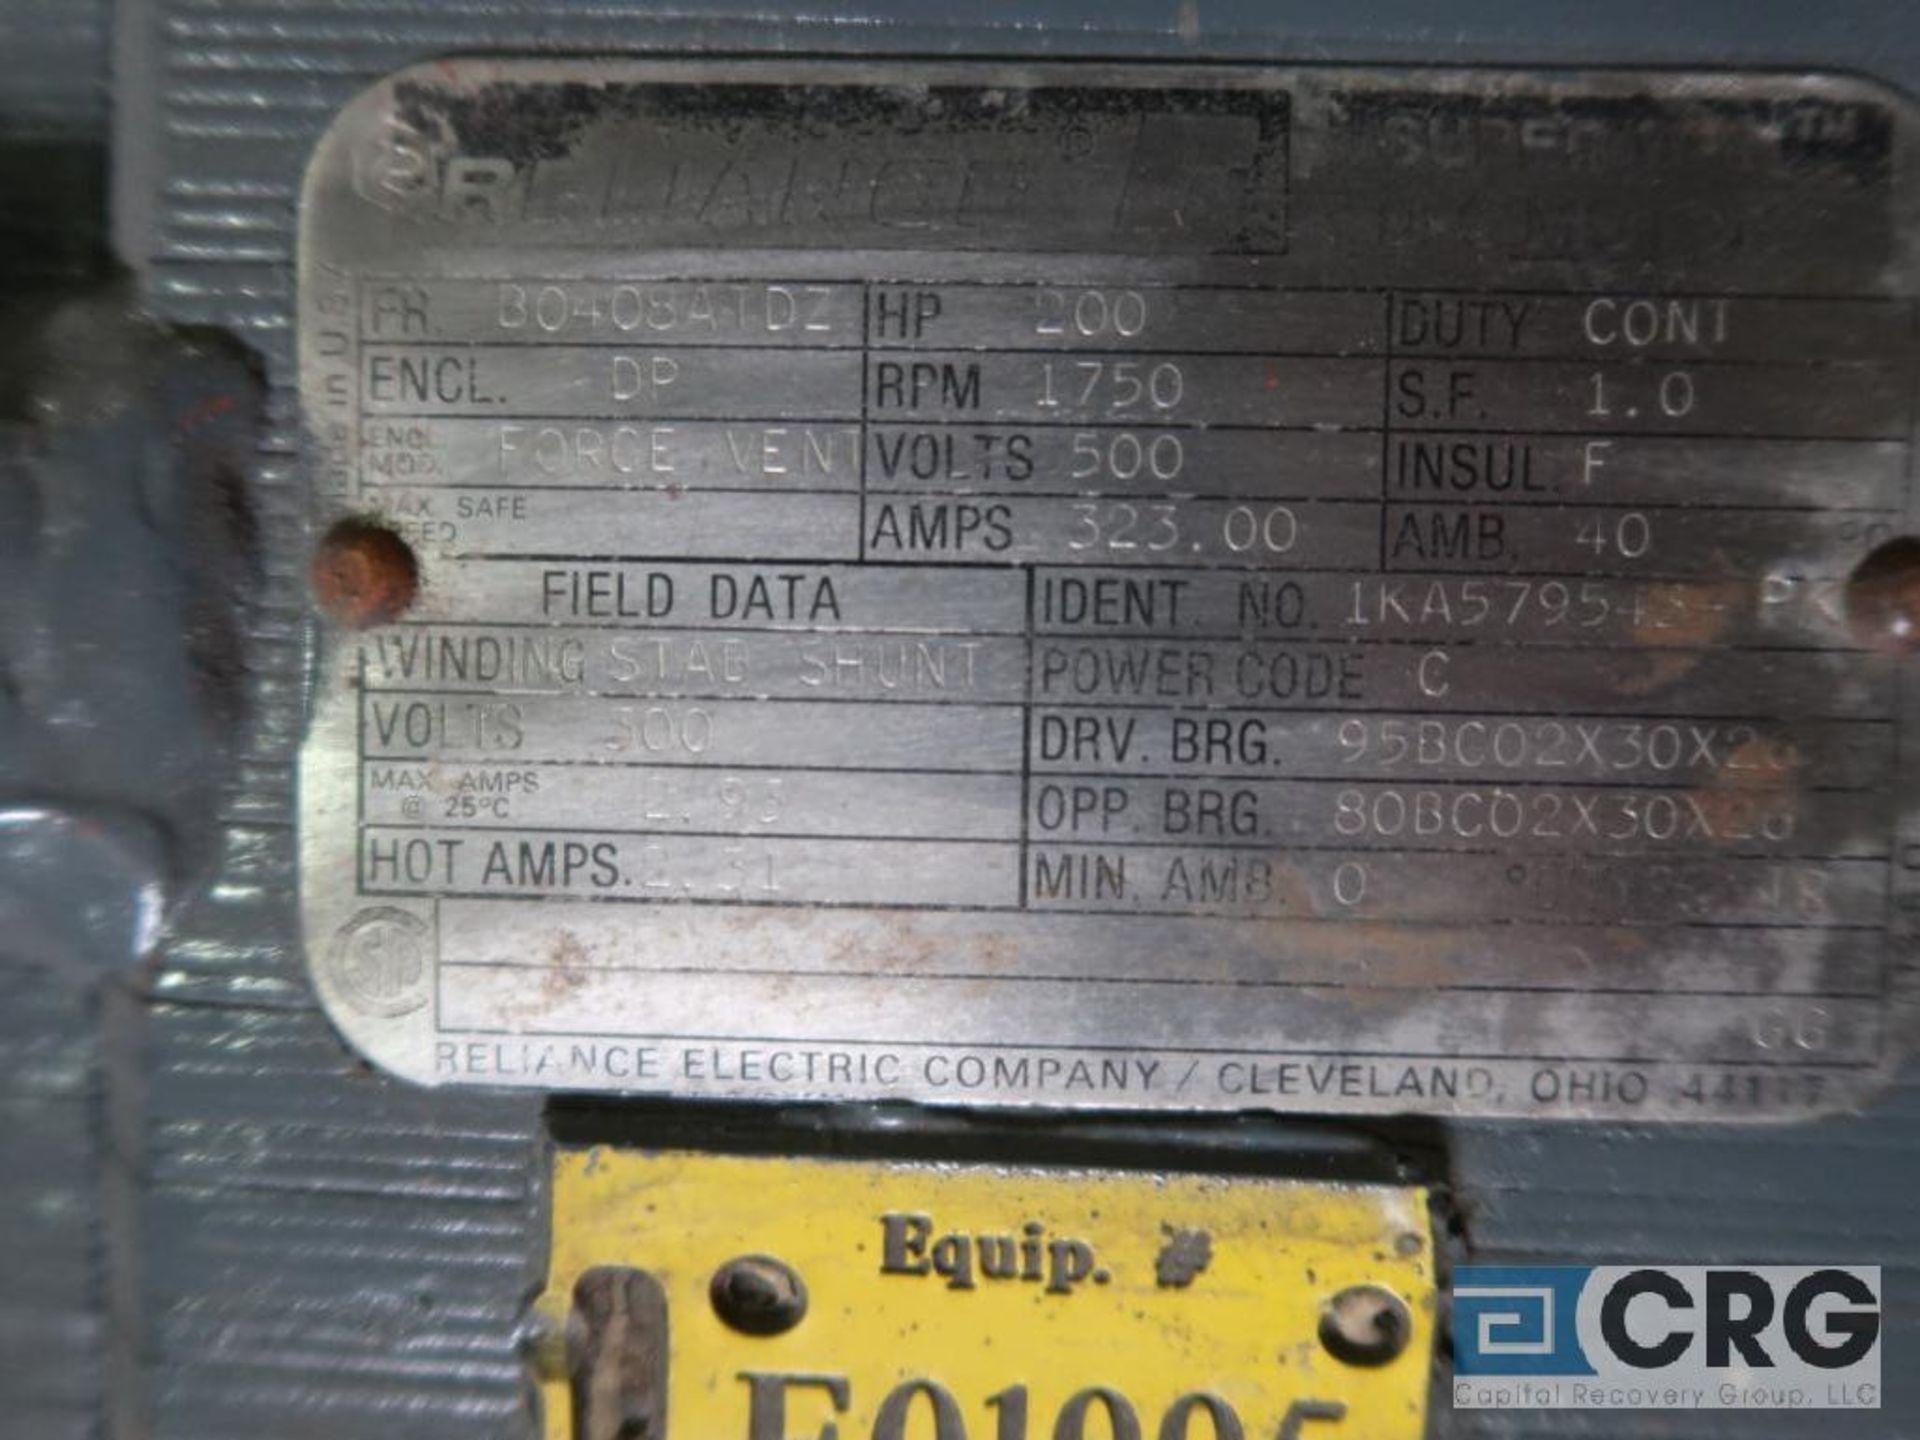 Reliance Super RPM DC motor, 200 HP, 1,750 RPMs, 500 volt, B0408ATOZ frame (Finish Building) - Image 2 of 2